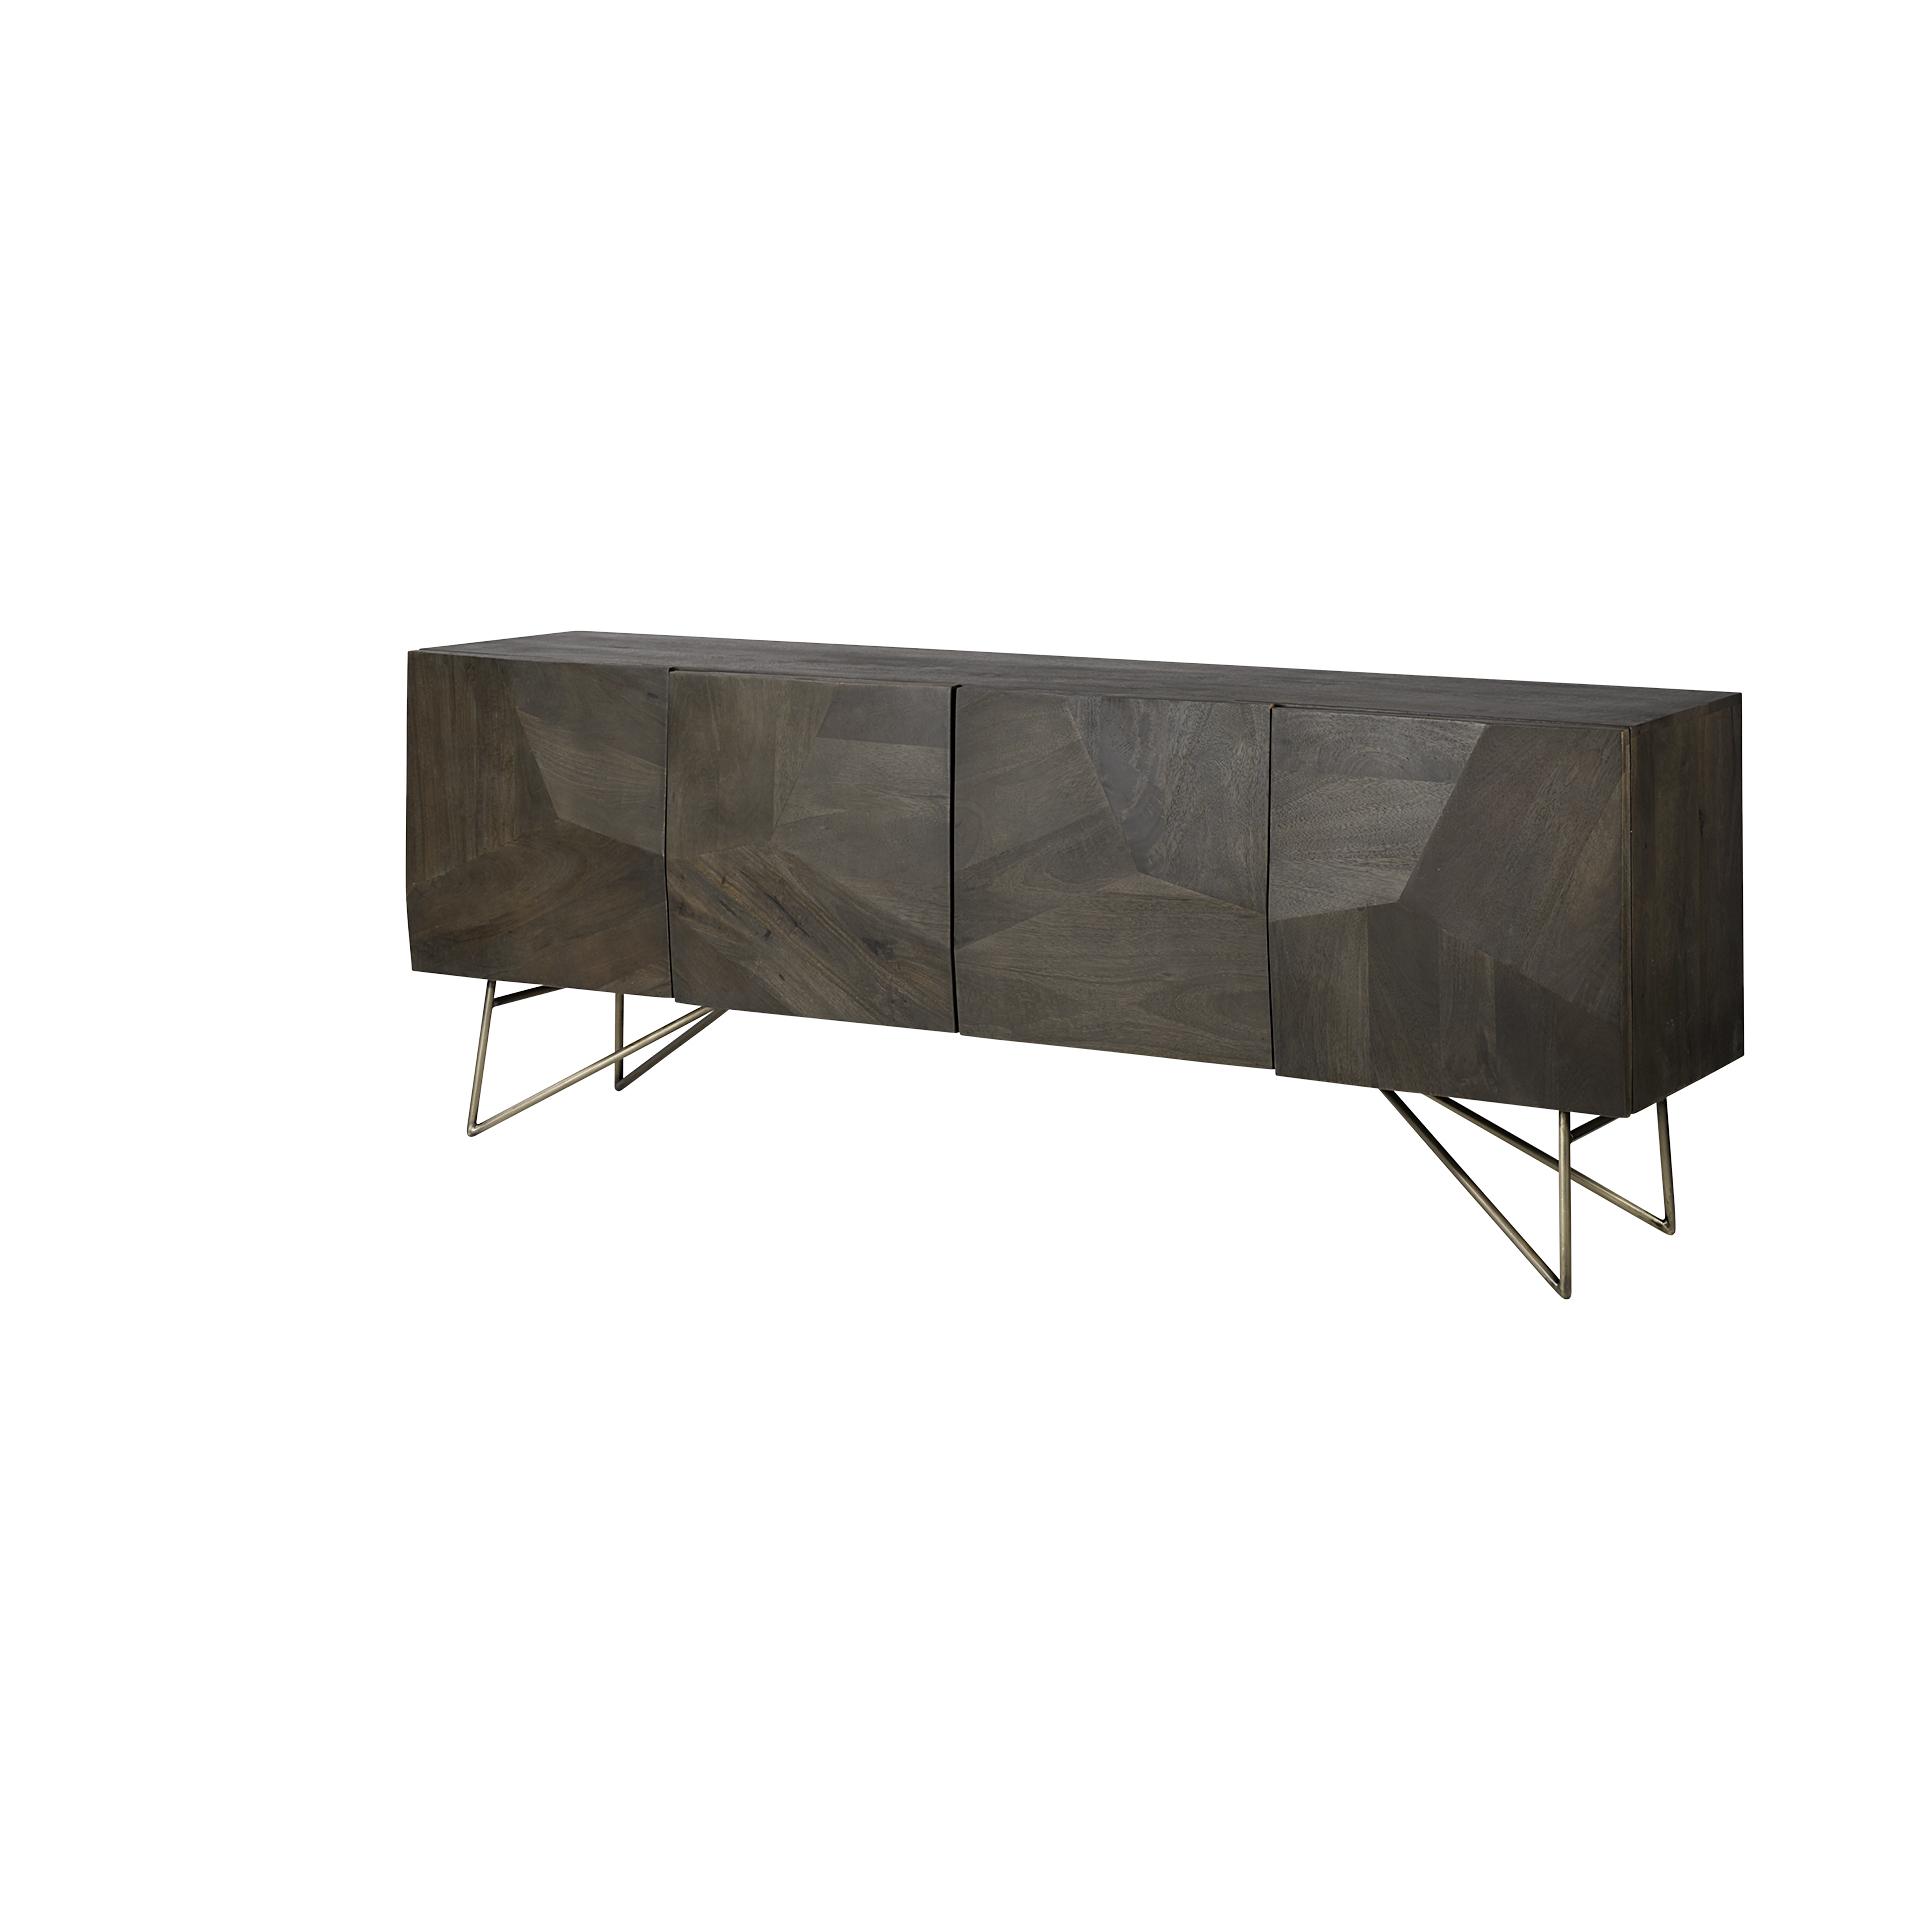 Dark Brown Solid Mango Wood Finish Sideboard With 4 Cabinet Doors